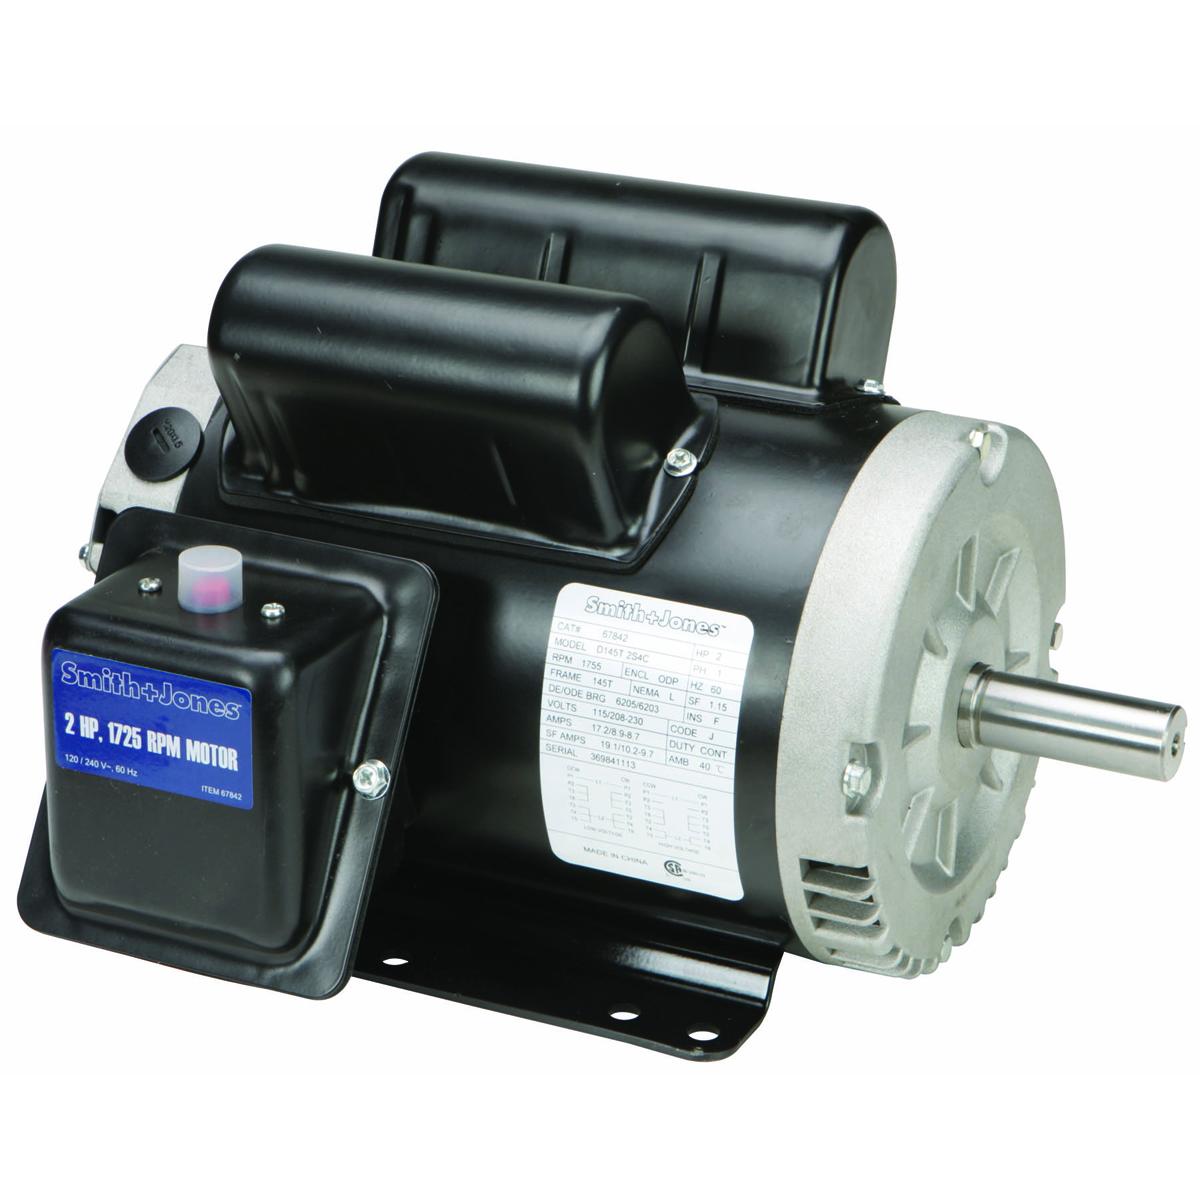 Emerson 2hp Electric Motor Wiring Diagram 2 Hp Compressor Duty Motor